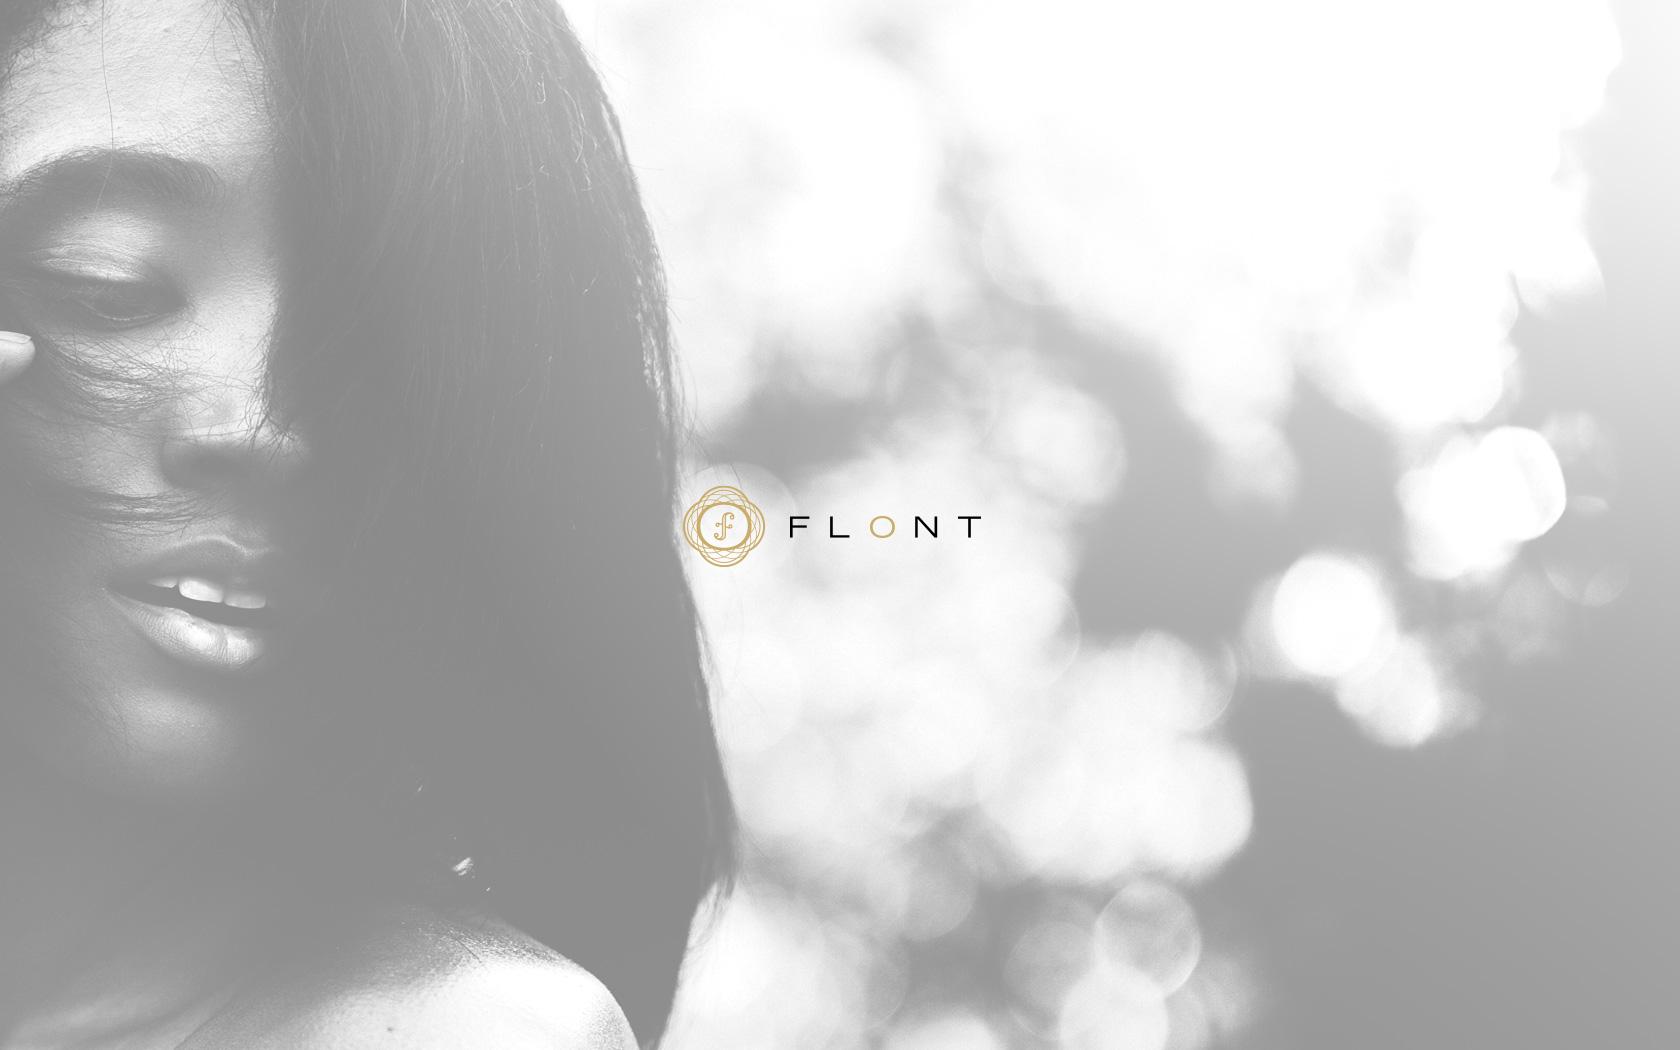 FLONT_X_MAMUS_CREATIVE_1